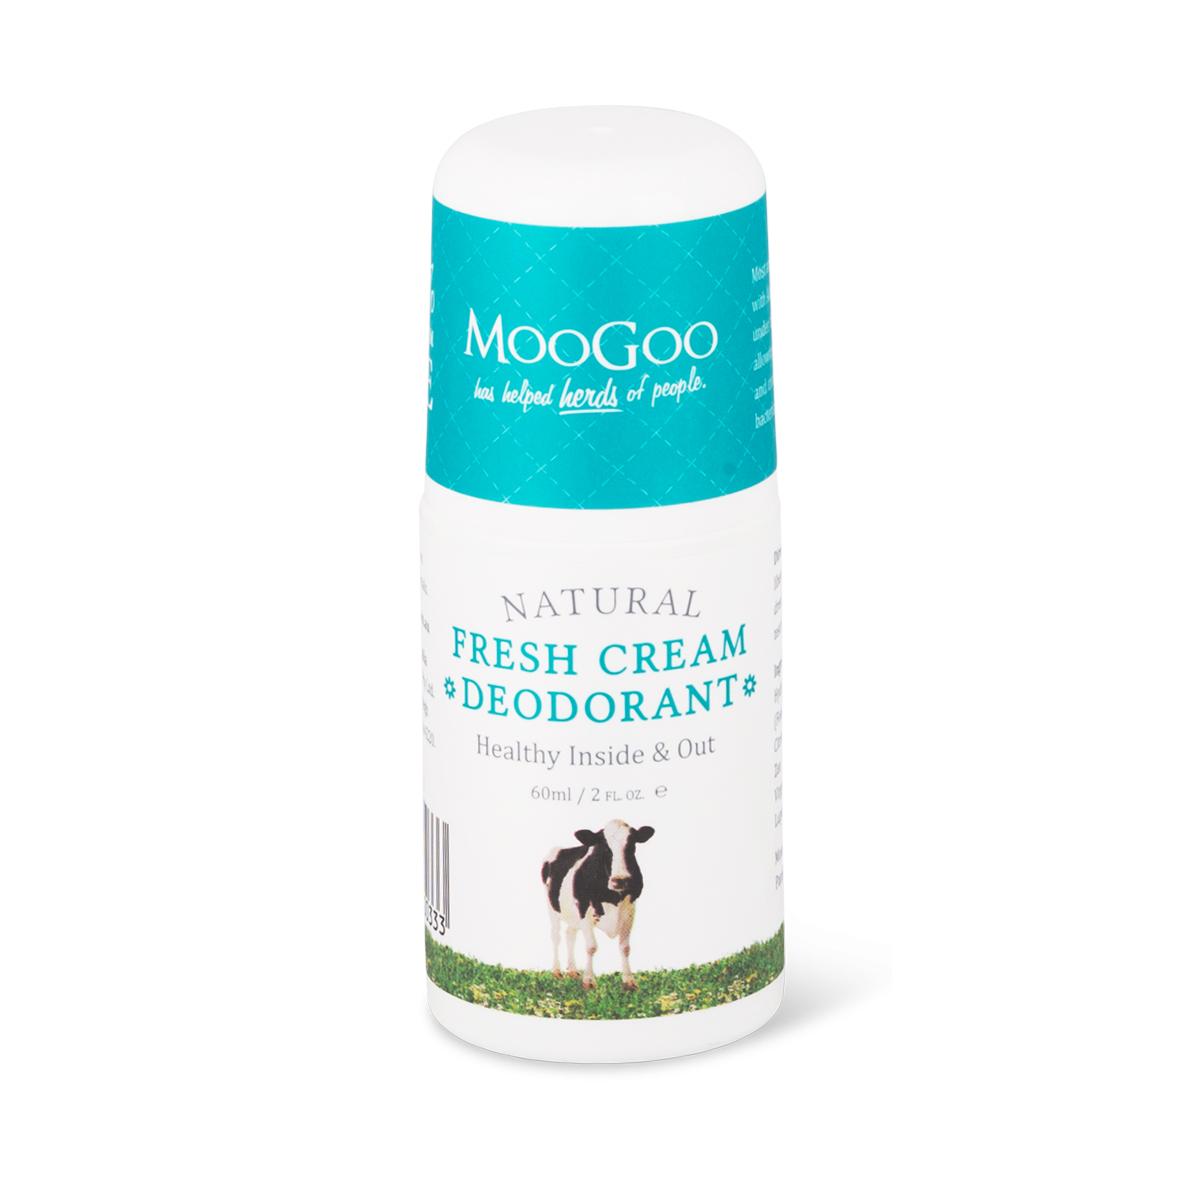 MooGoo_FreshCreamDeodorant.jpg